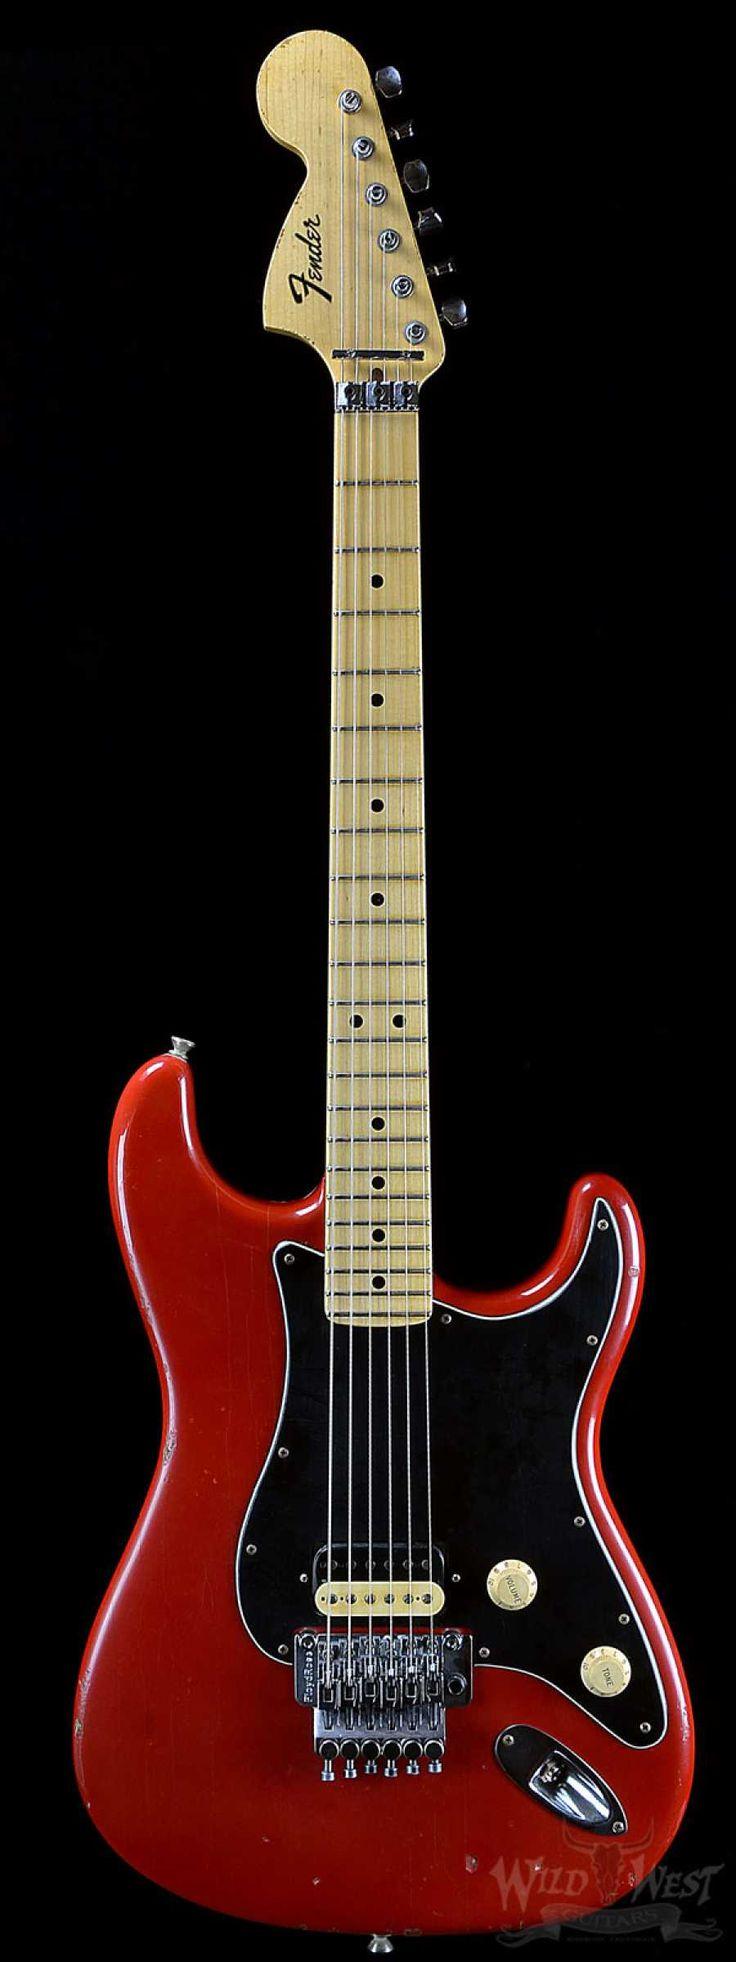 Fender Masterbuilt Jason Smith Relic Dakota Red 1969 Stratocaster w/ Floyd Rose - Wild West Guitars